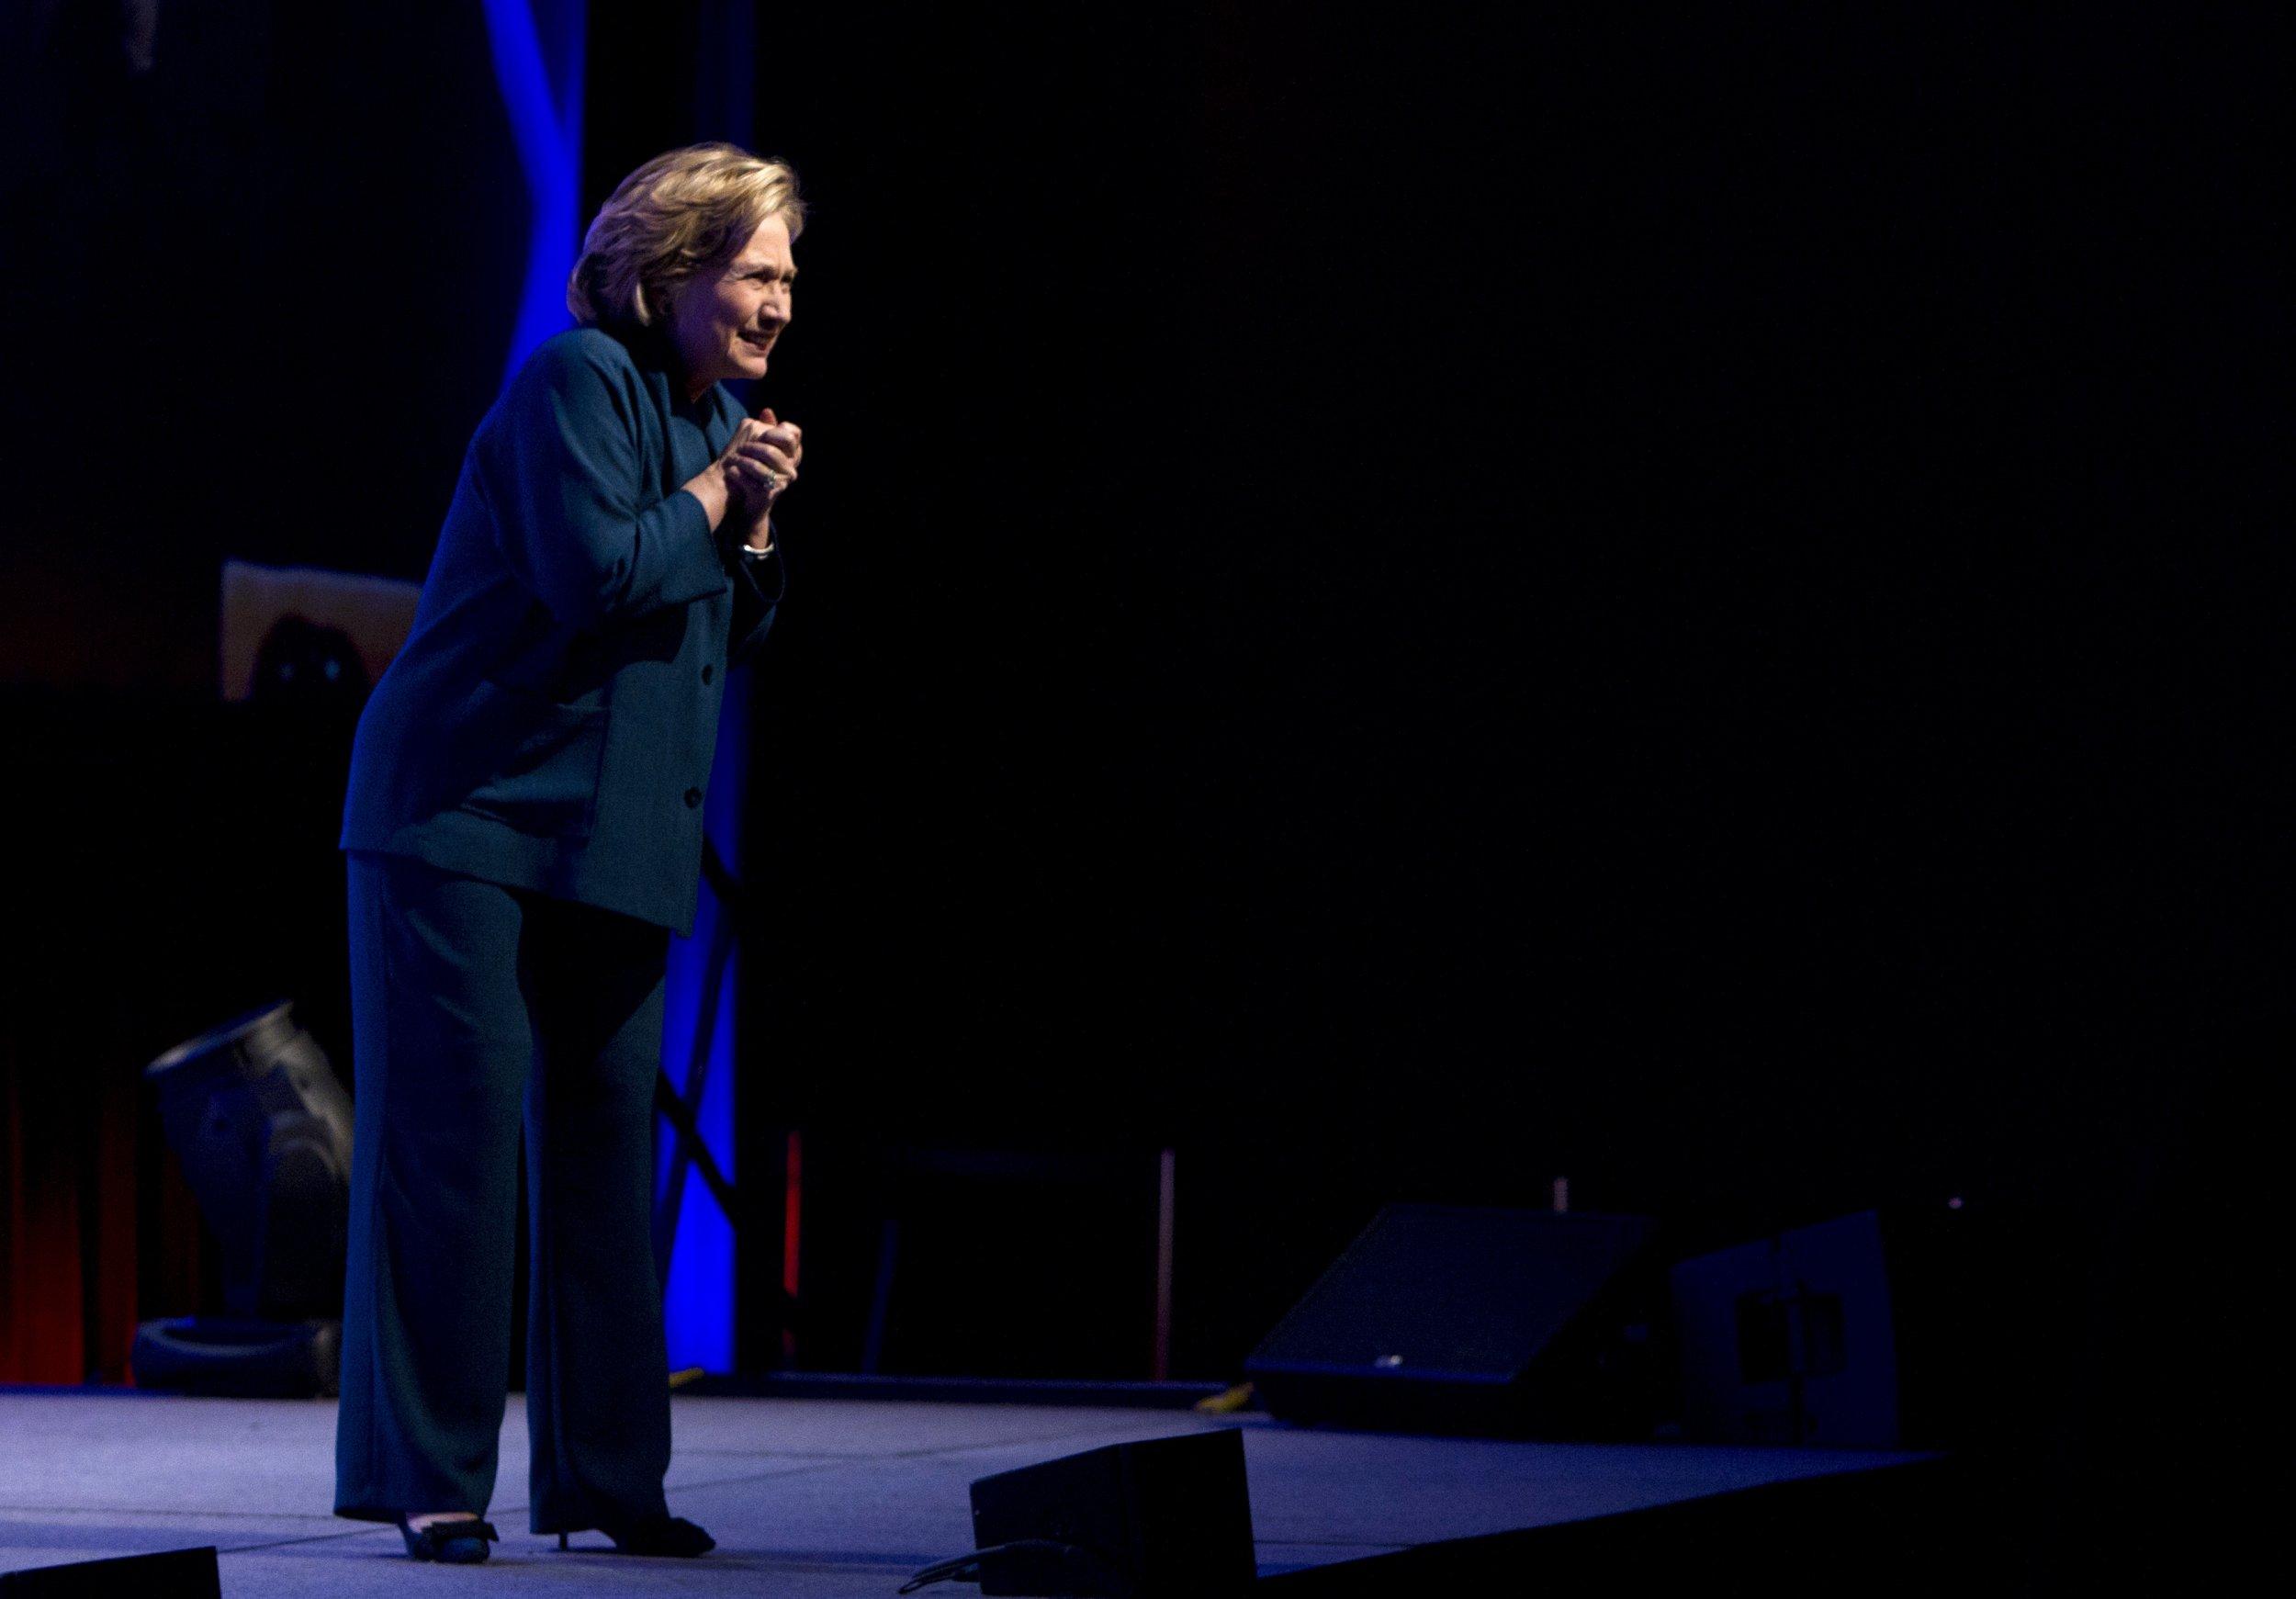 Clinton shoe